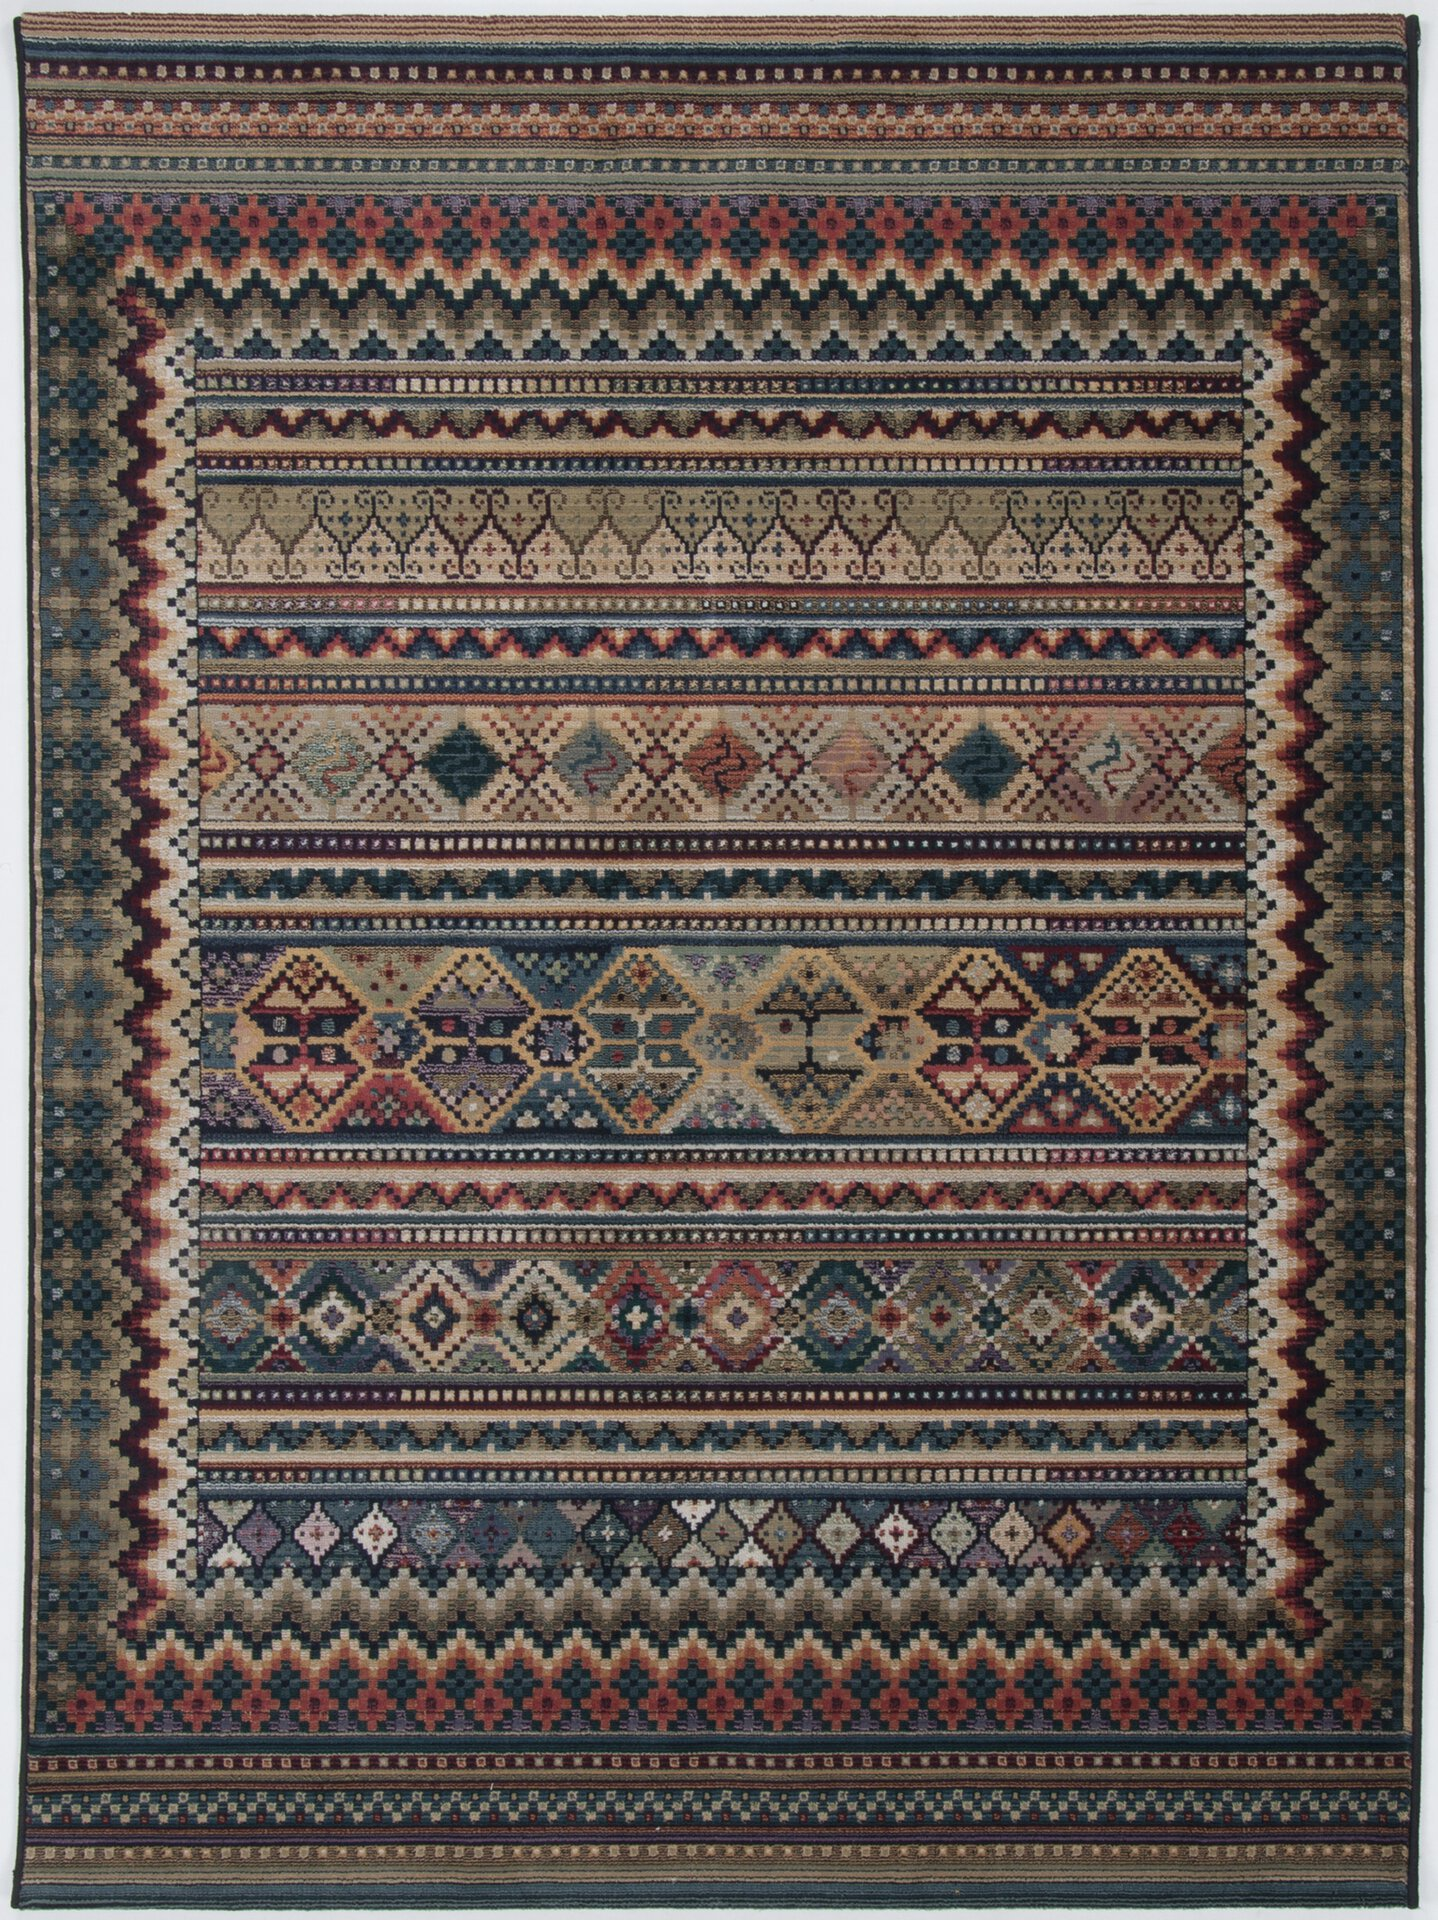 Maschinenwebteppich Gabiro Theko Textil mehrfarbig 60 x 90 cm